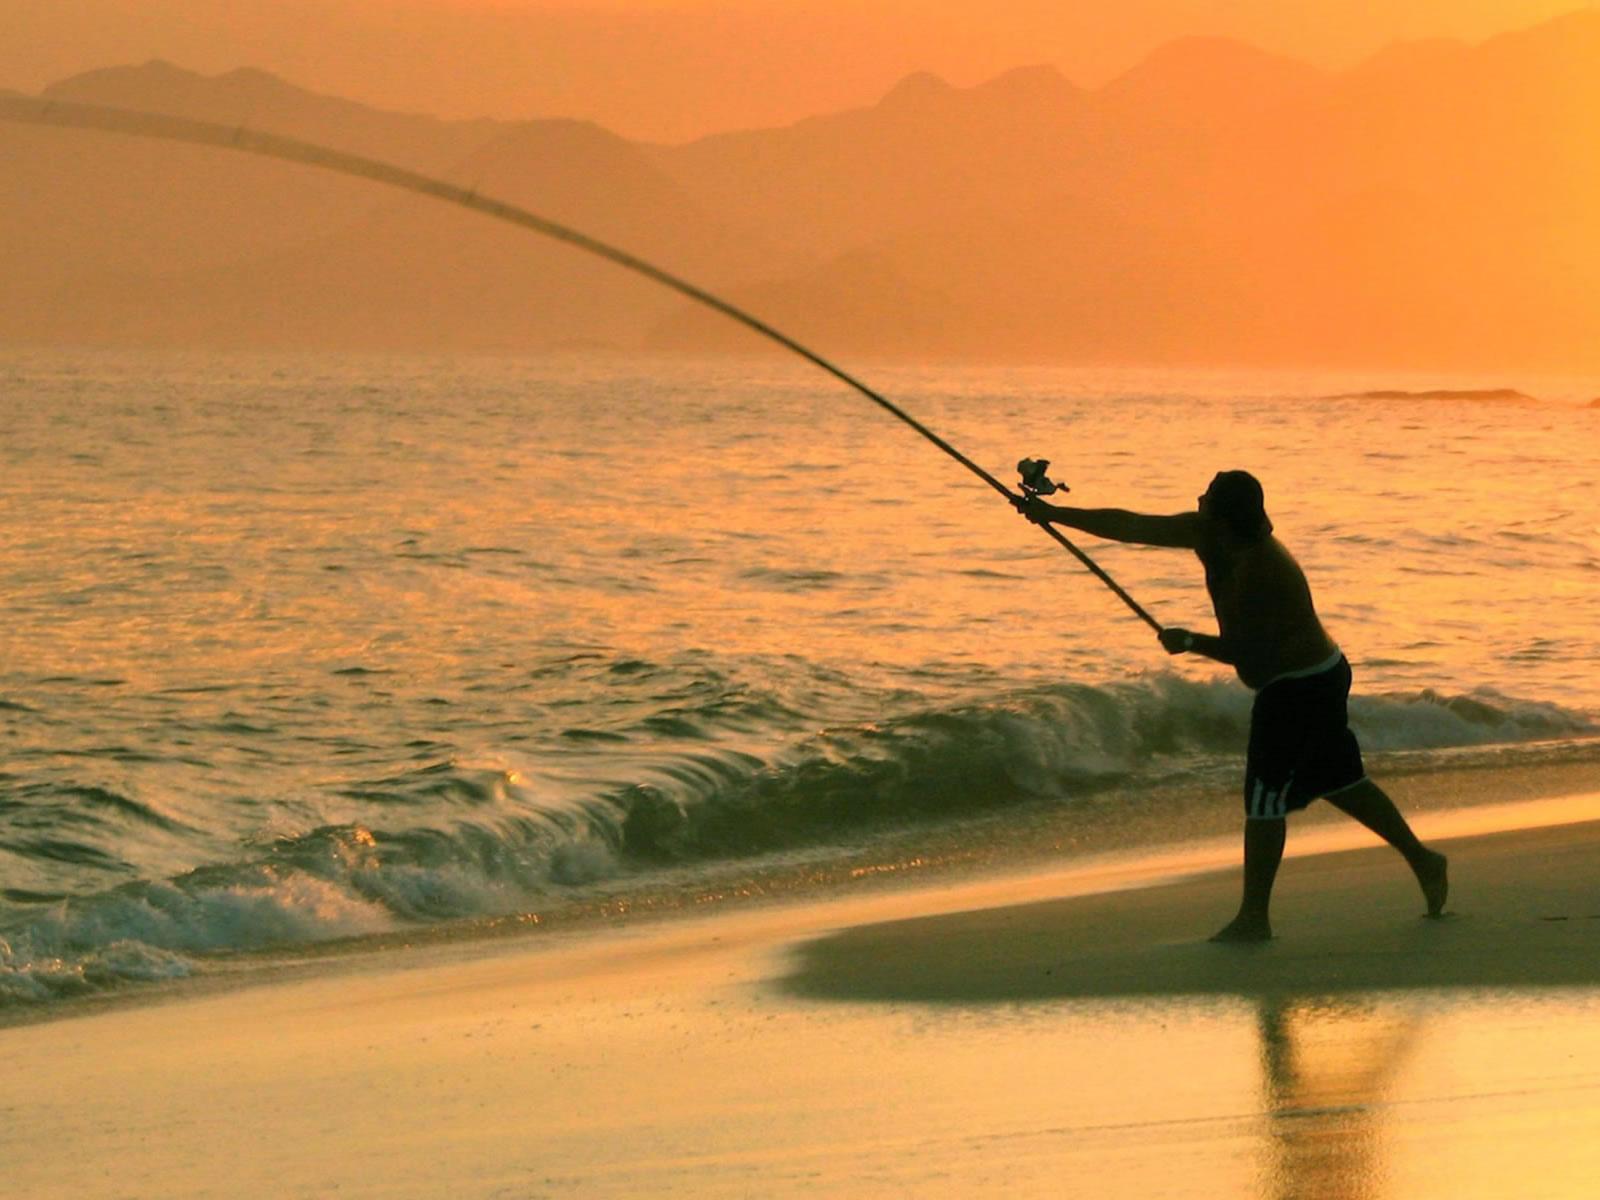 fishing 1600x1200 wallpapers download desktop wallpapers hd 1066x800 1600x1200